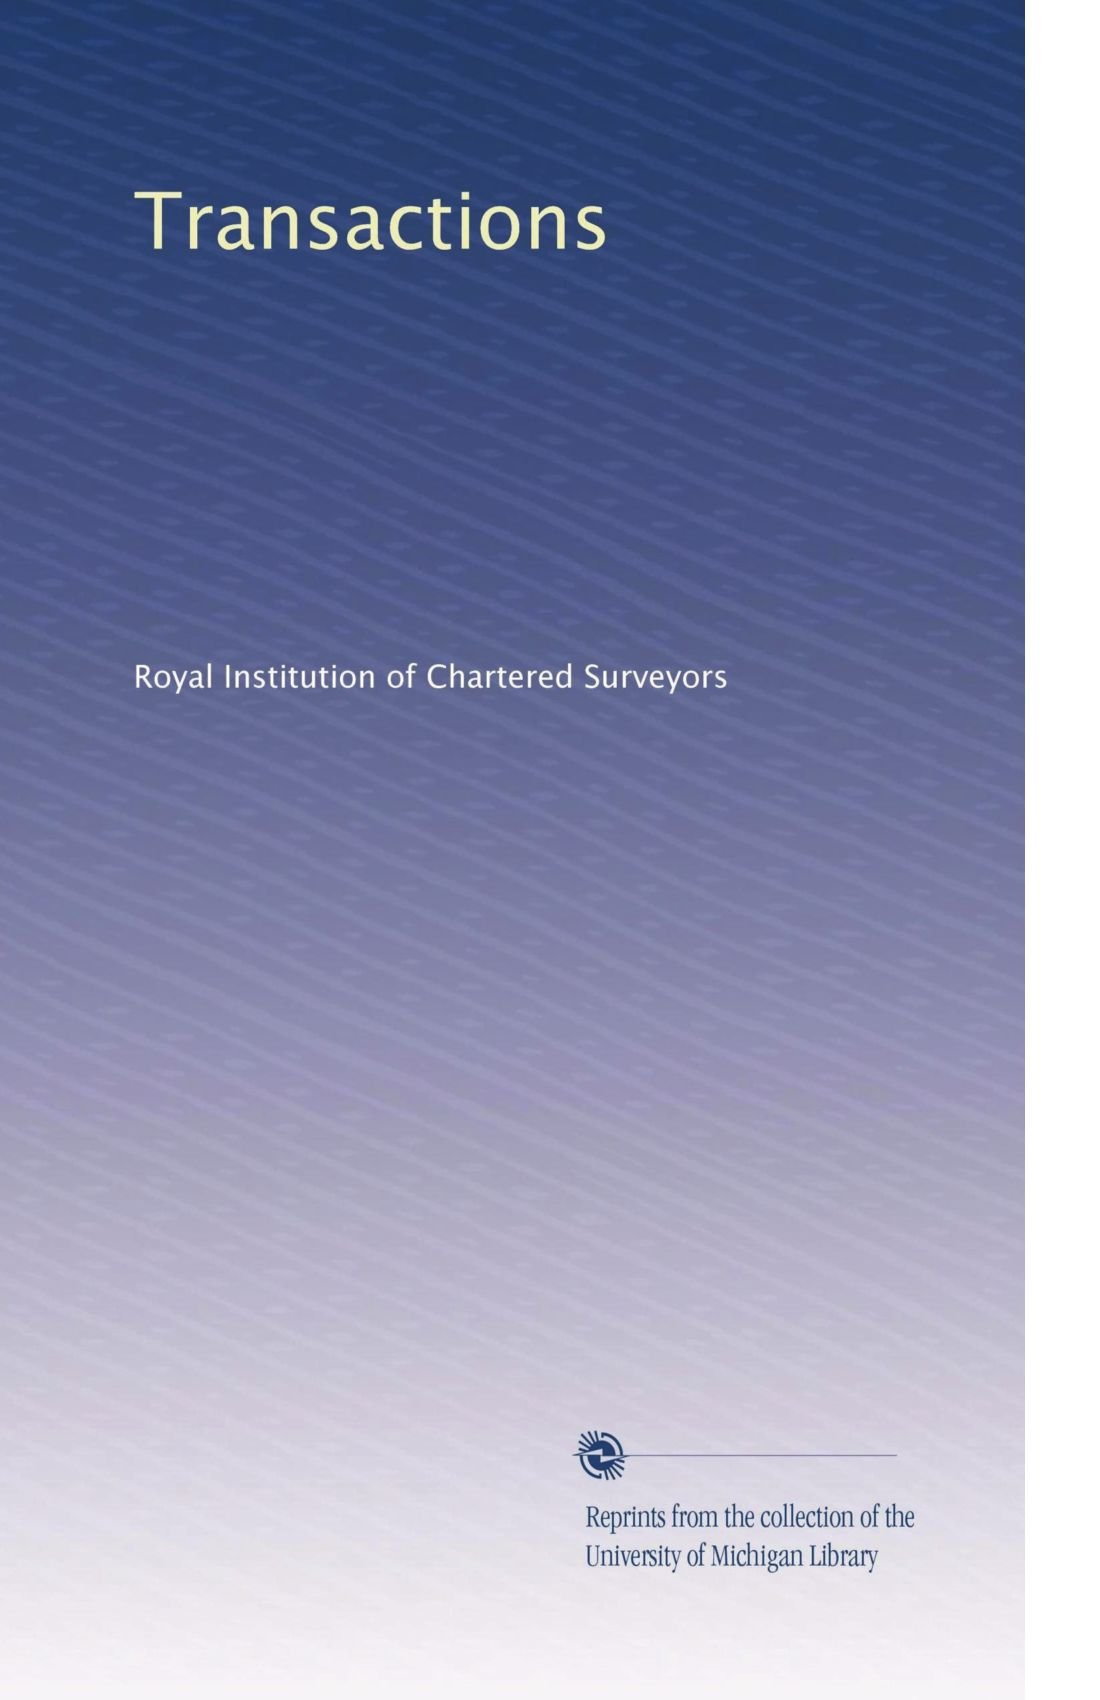 Transactions (Volume 50) pdf